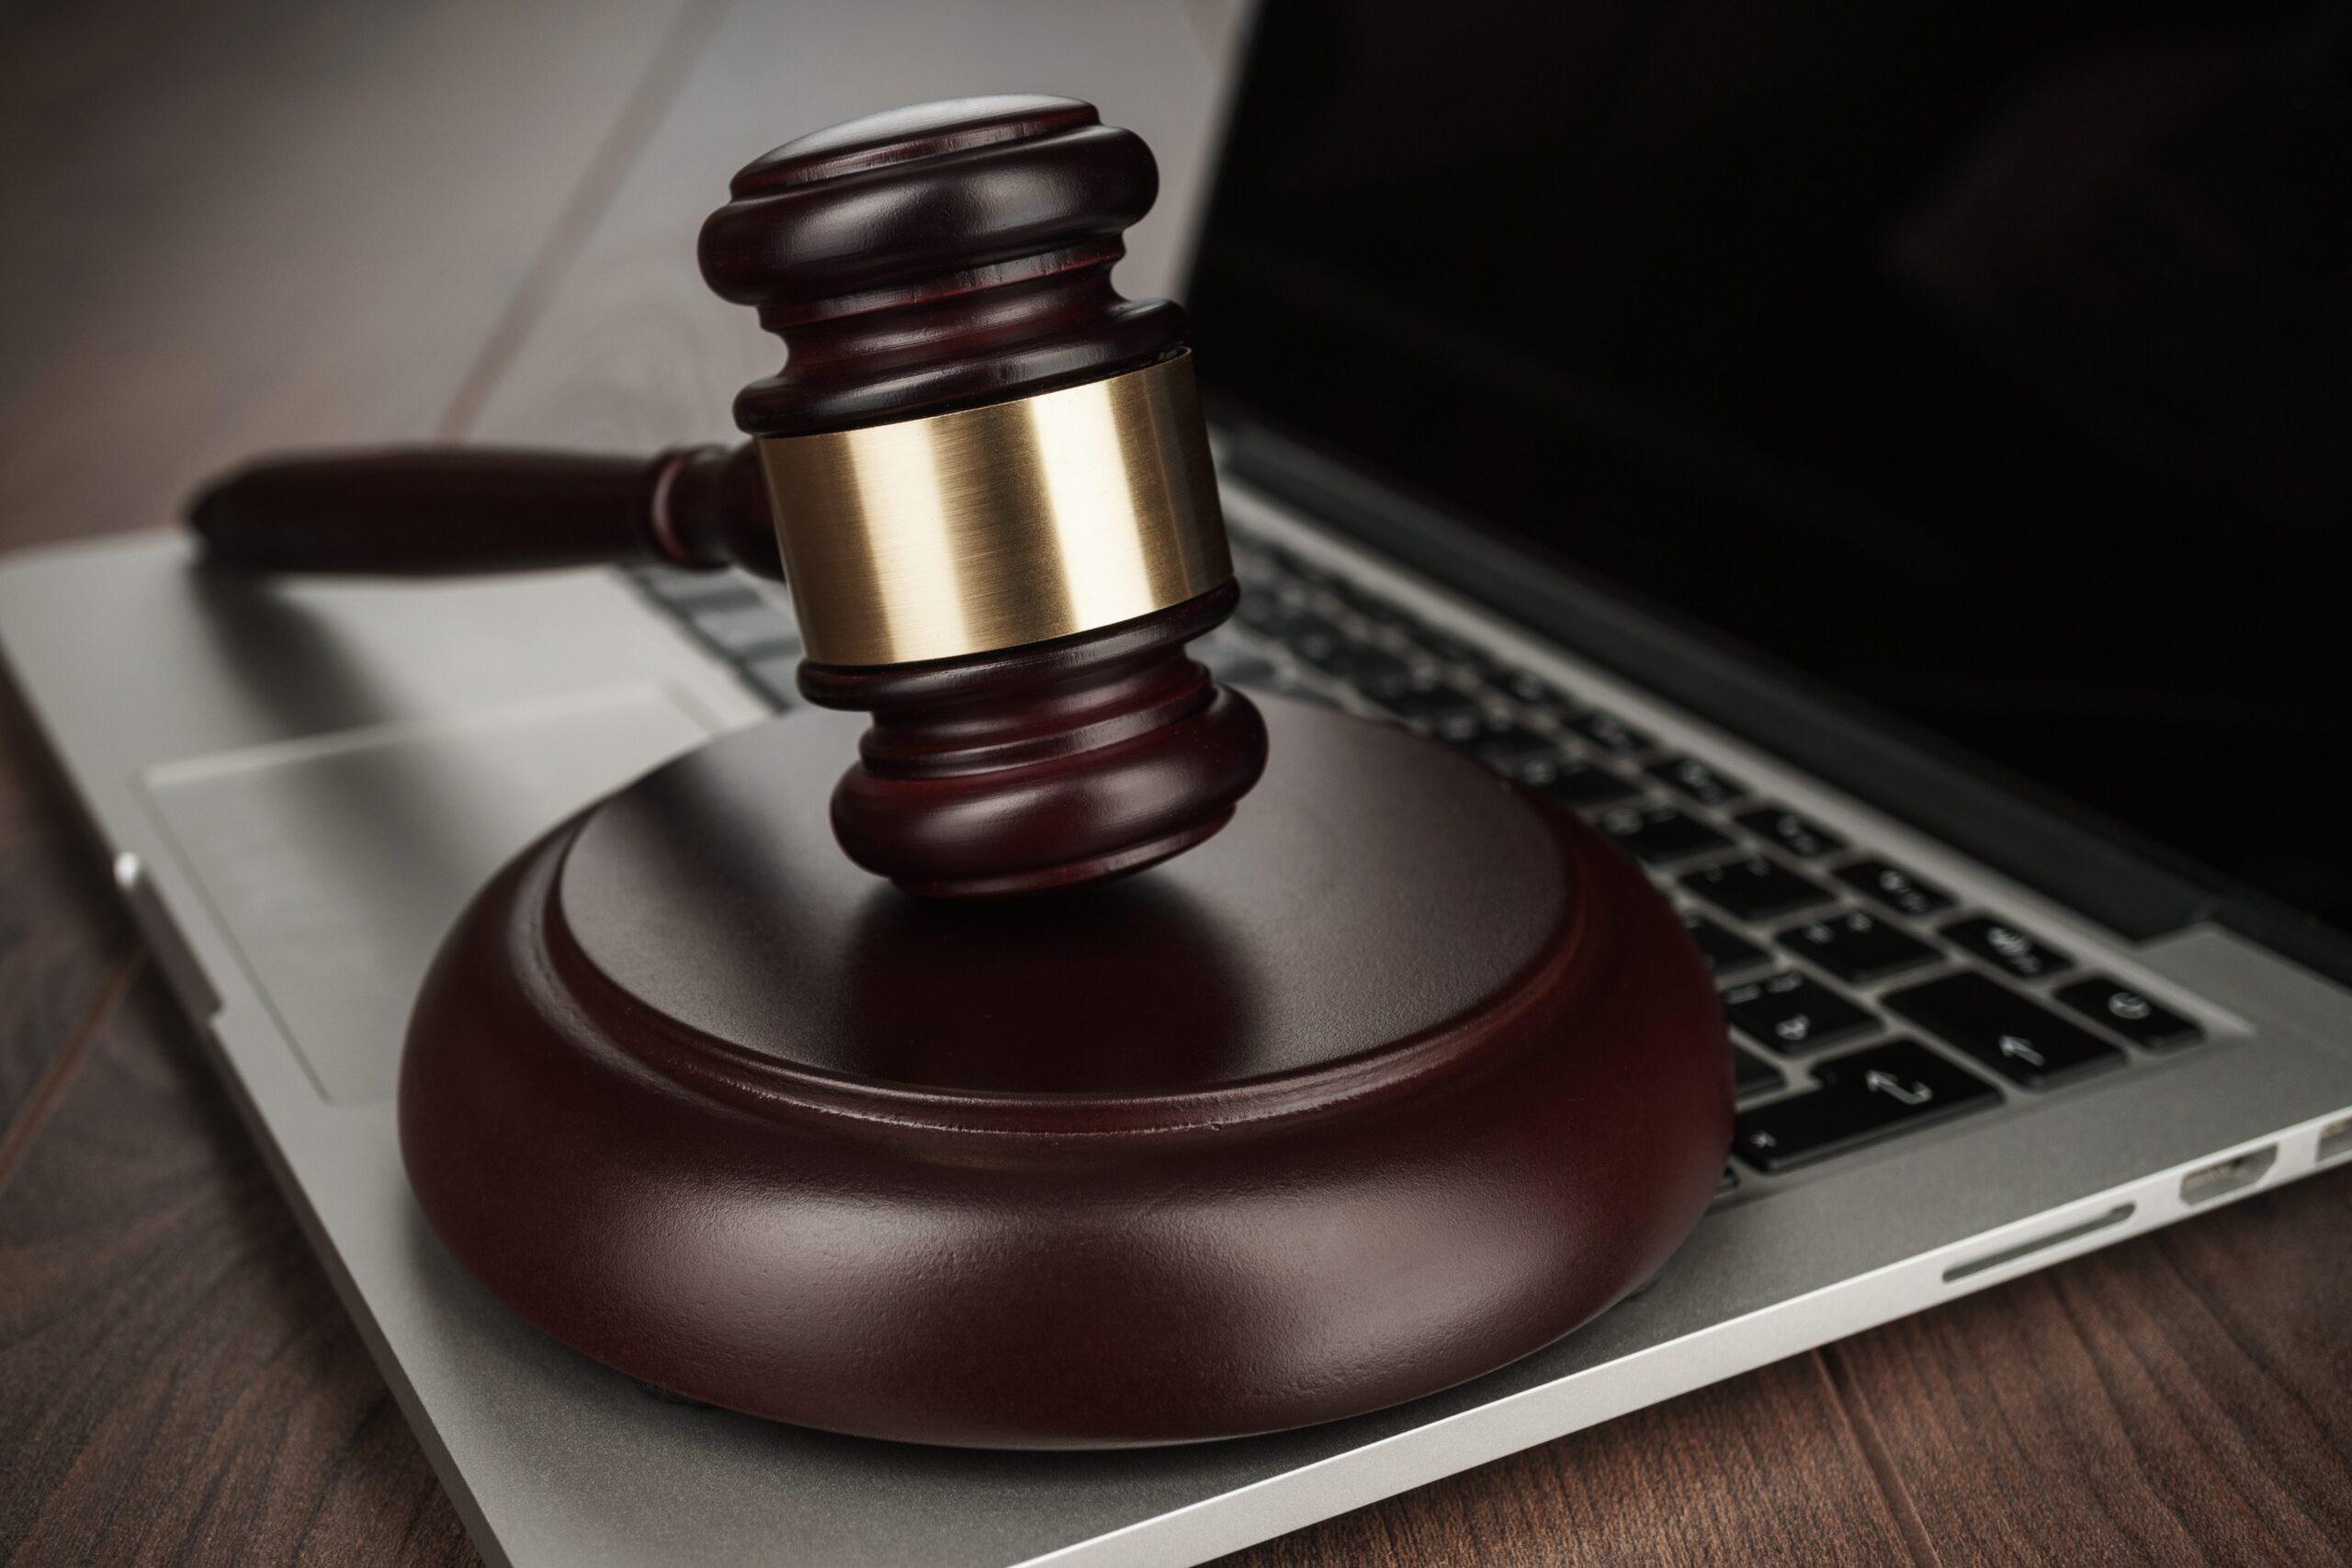 judge-gavel-on-laptop-concept-XKJBUE3(1)